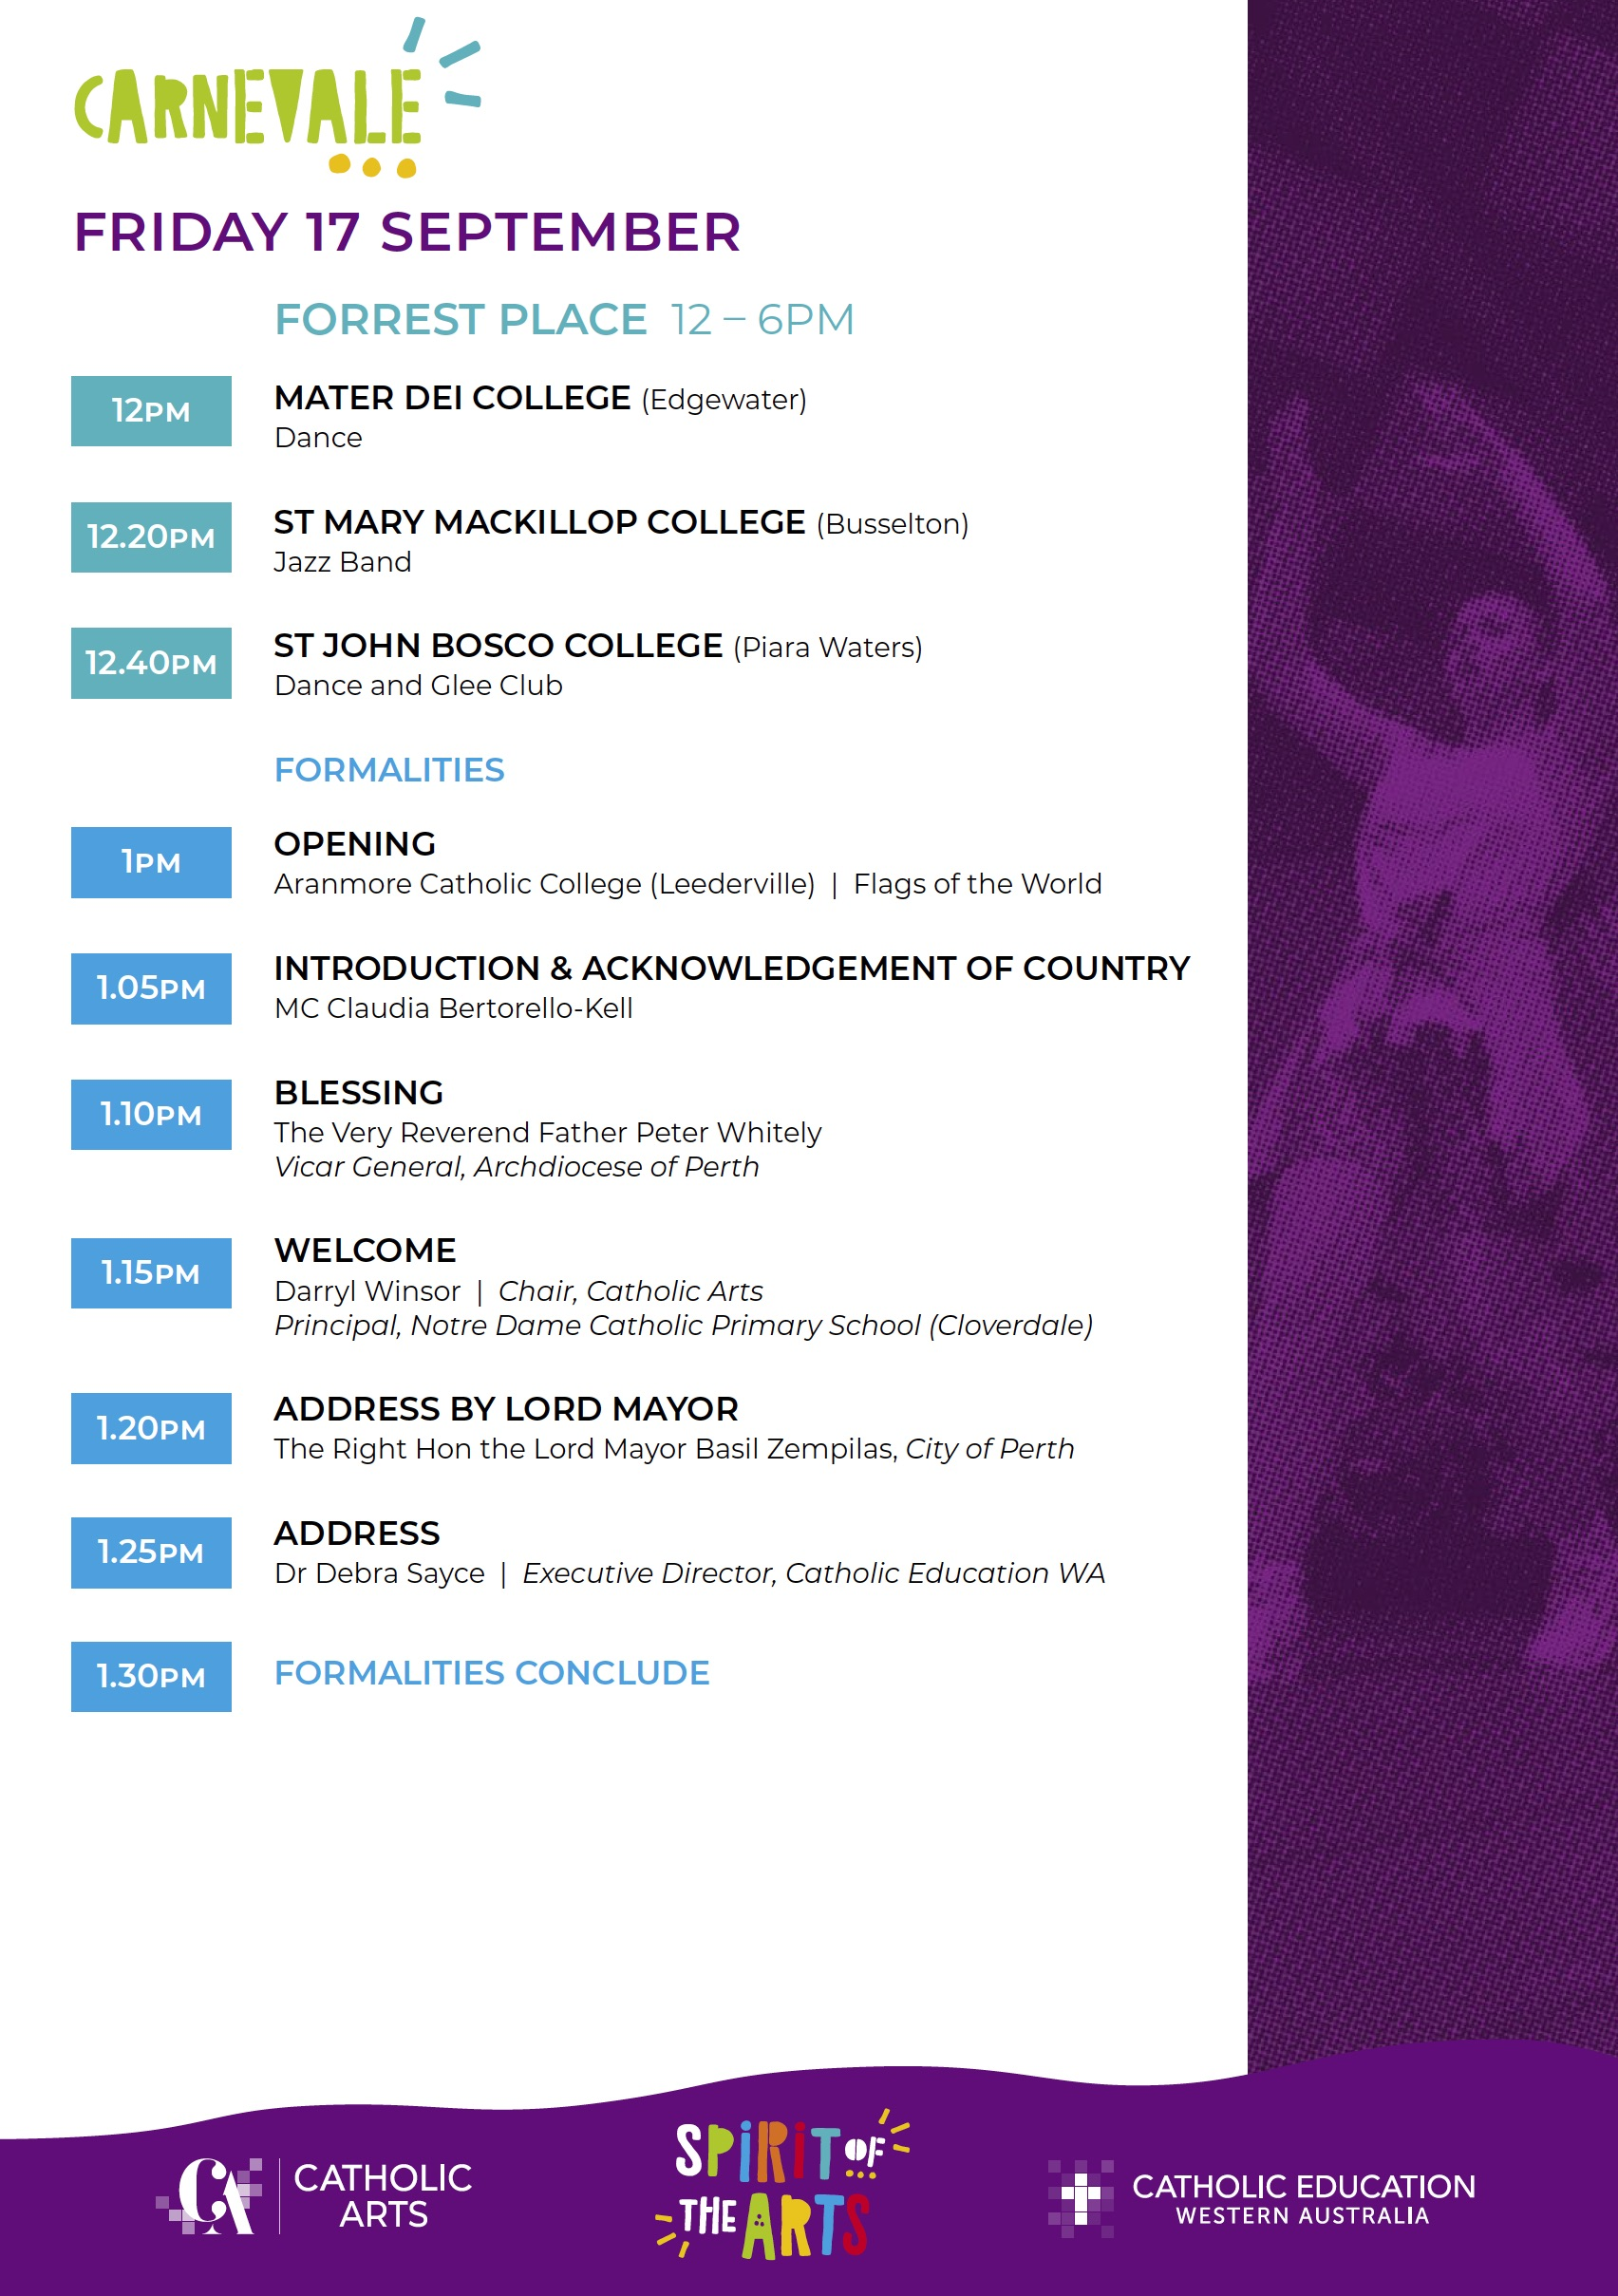 2021_09_SpiritOfTheArts_Carnivale_Program_Friday_pdf